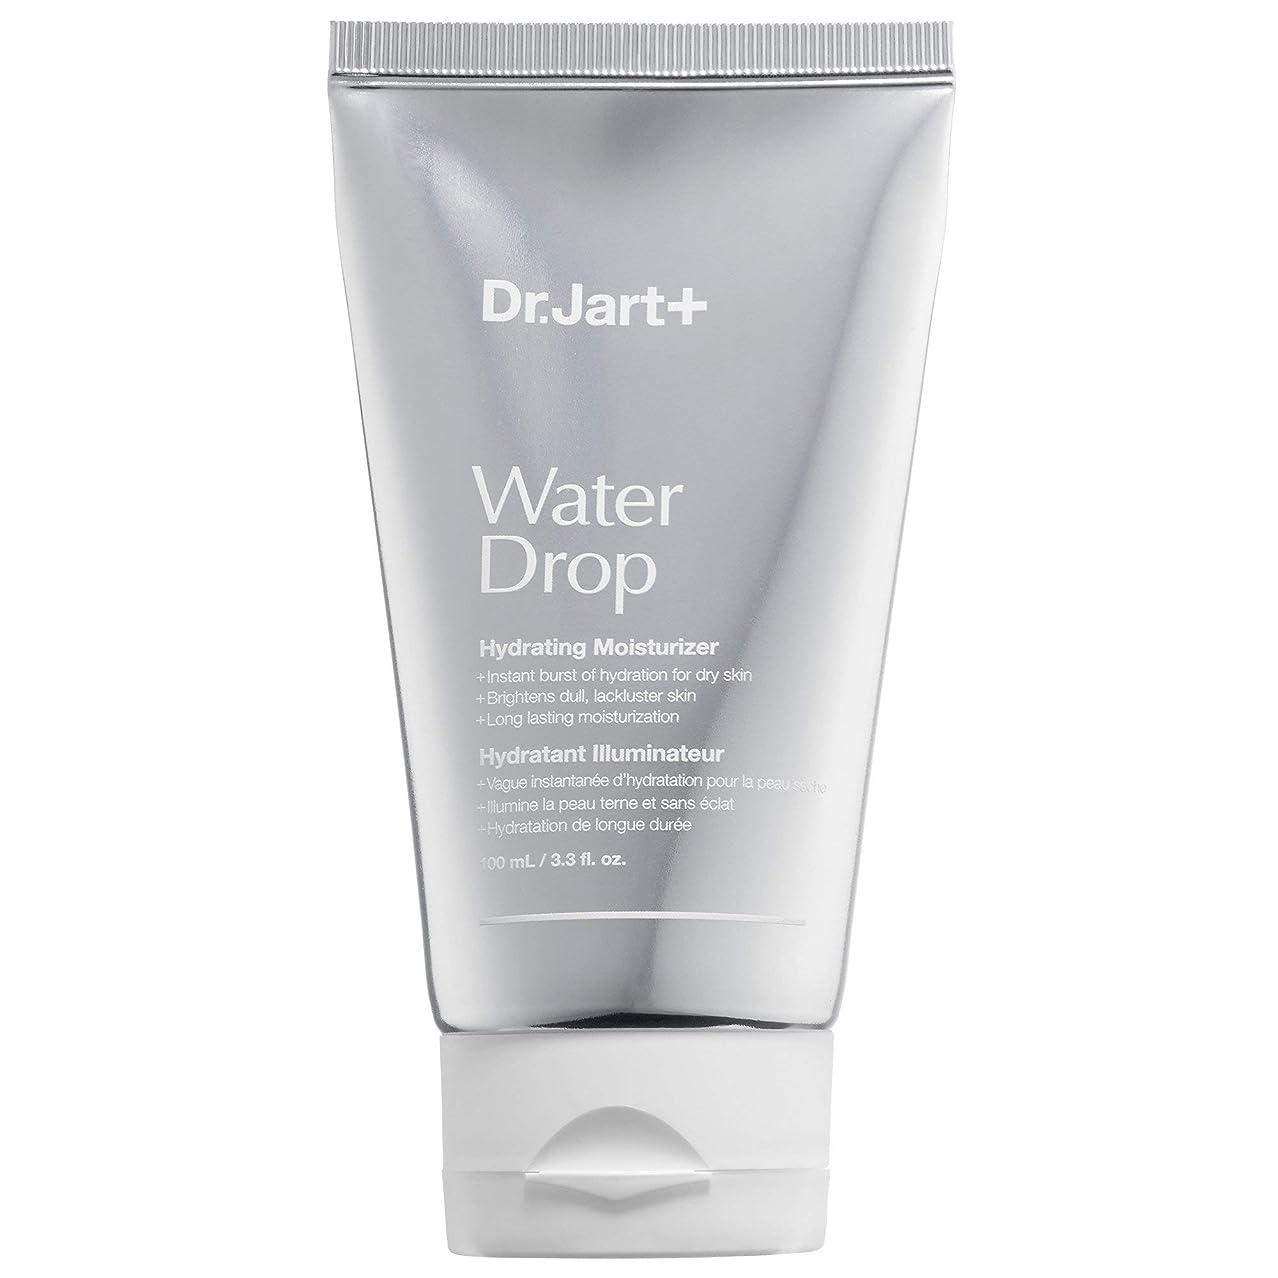 情熱当社縁石Dr.jart+ Water Drop Hydrating Moisturizer